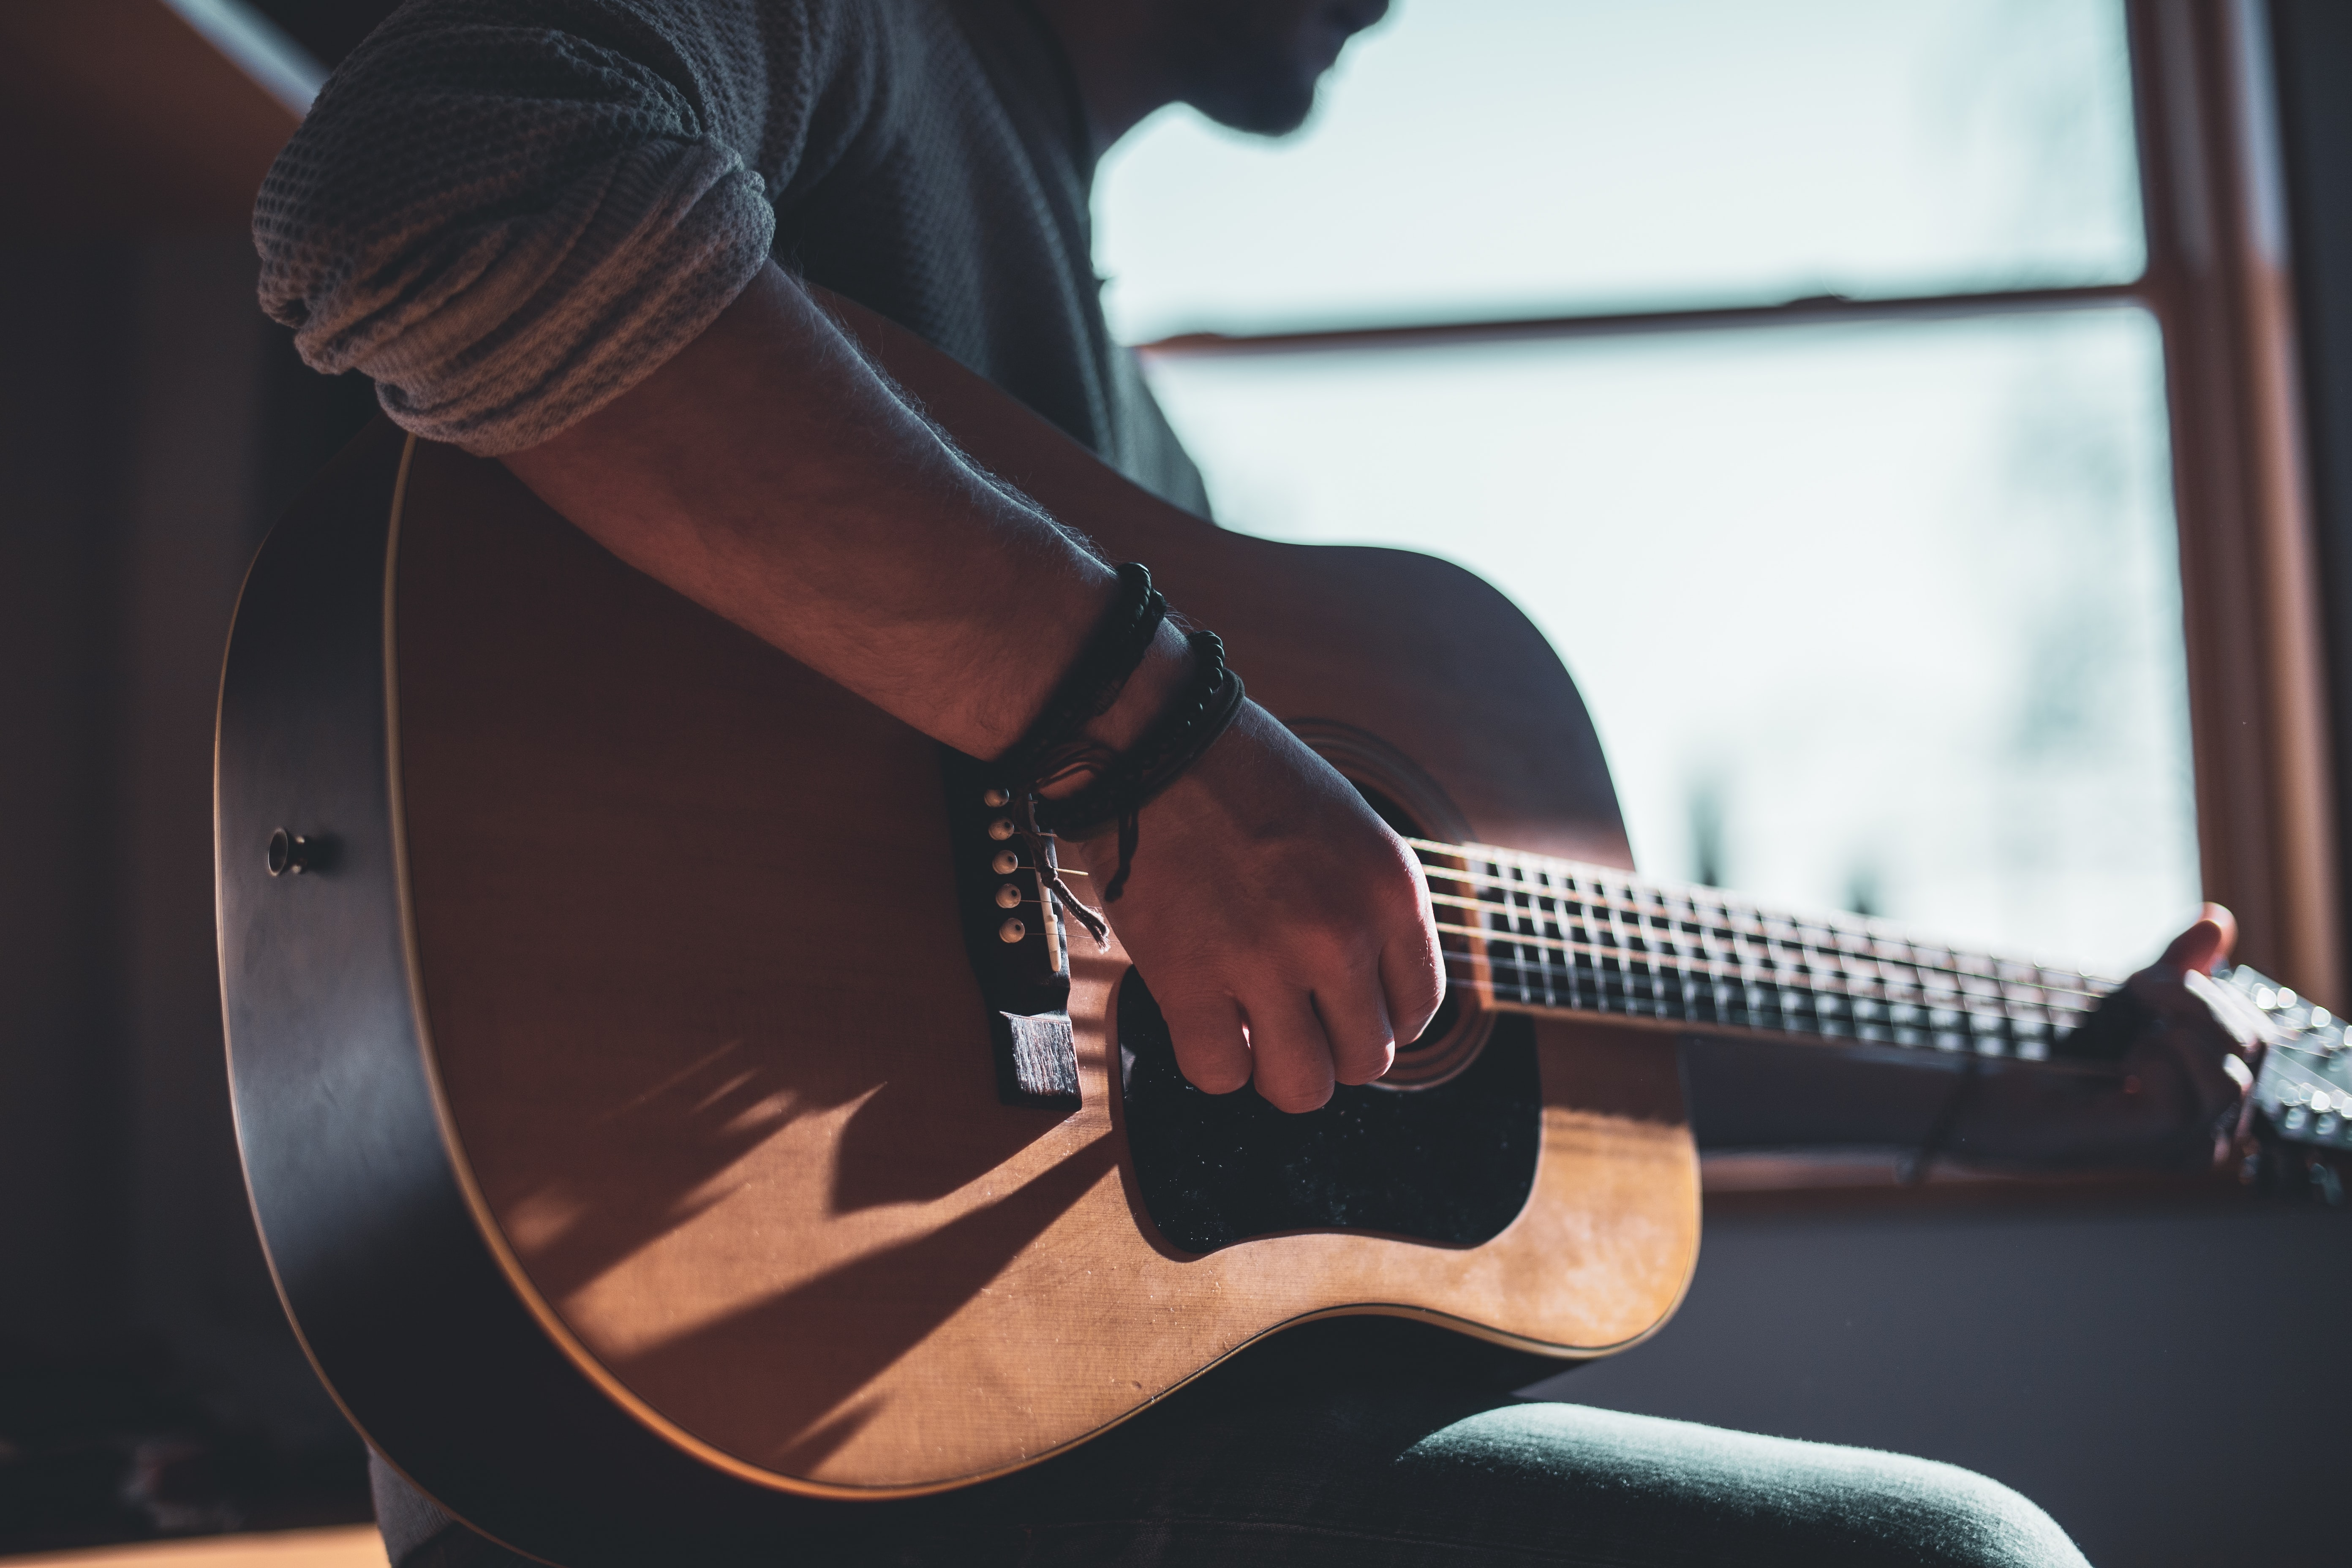 man guitar learn new skill music new year resolution singing biniblog localbini lifestyle tips